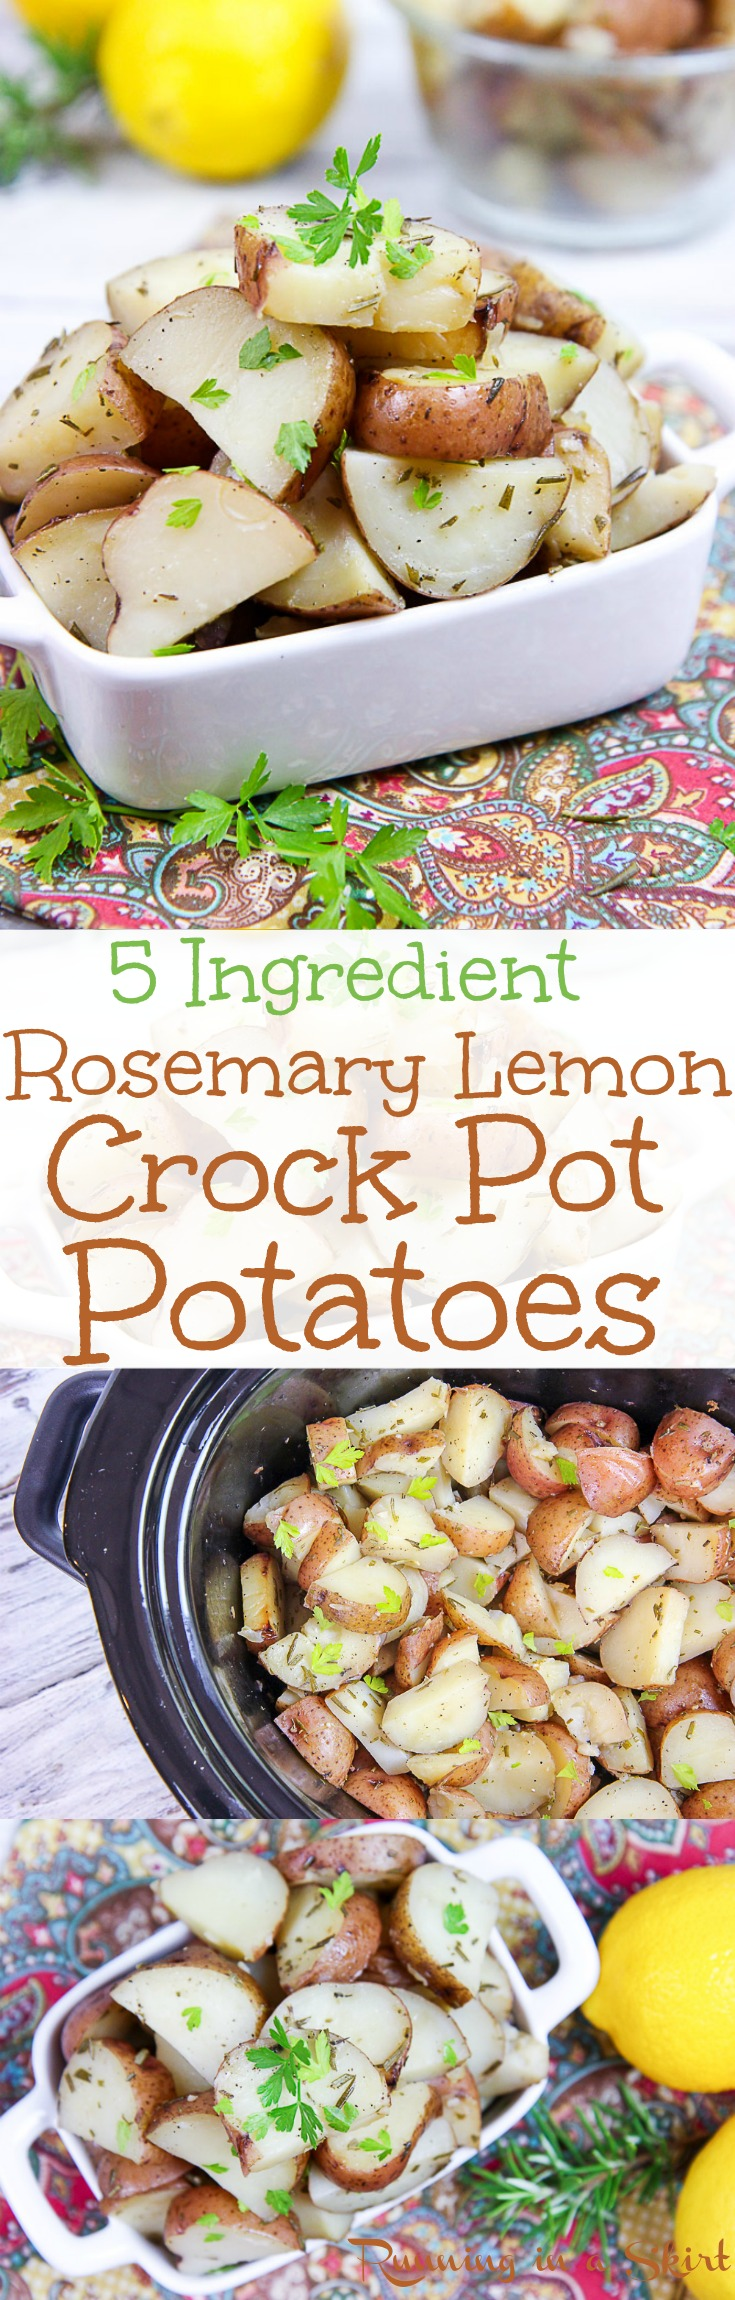 5 Ingredient Crock Pot Rosemary Potatoes